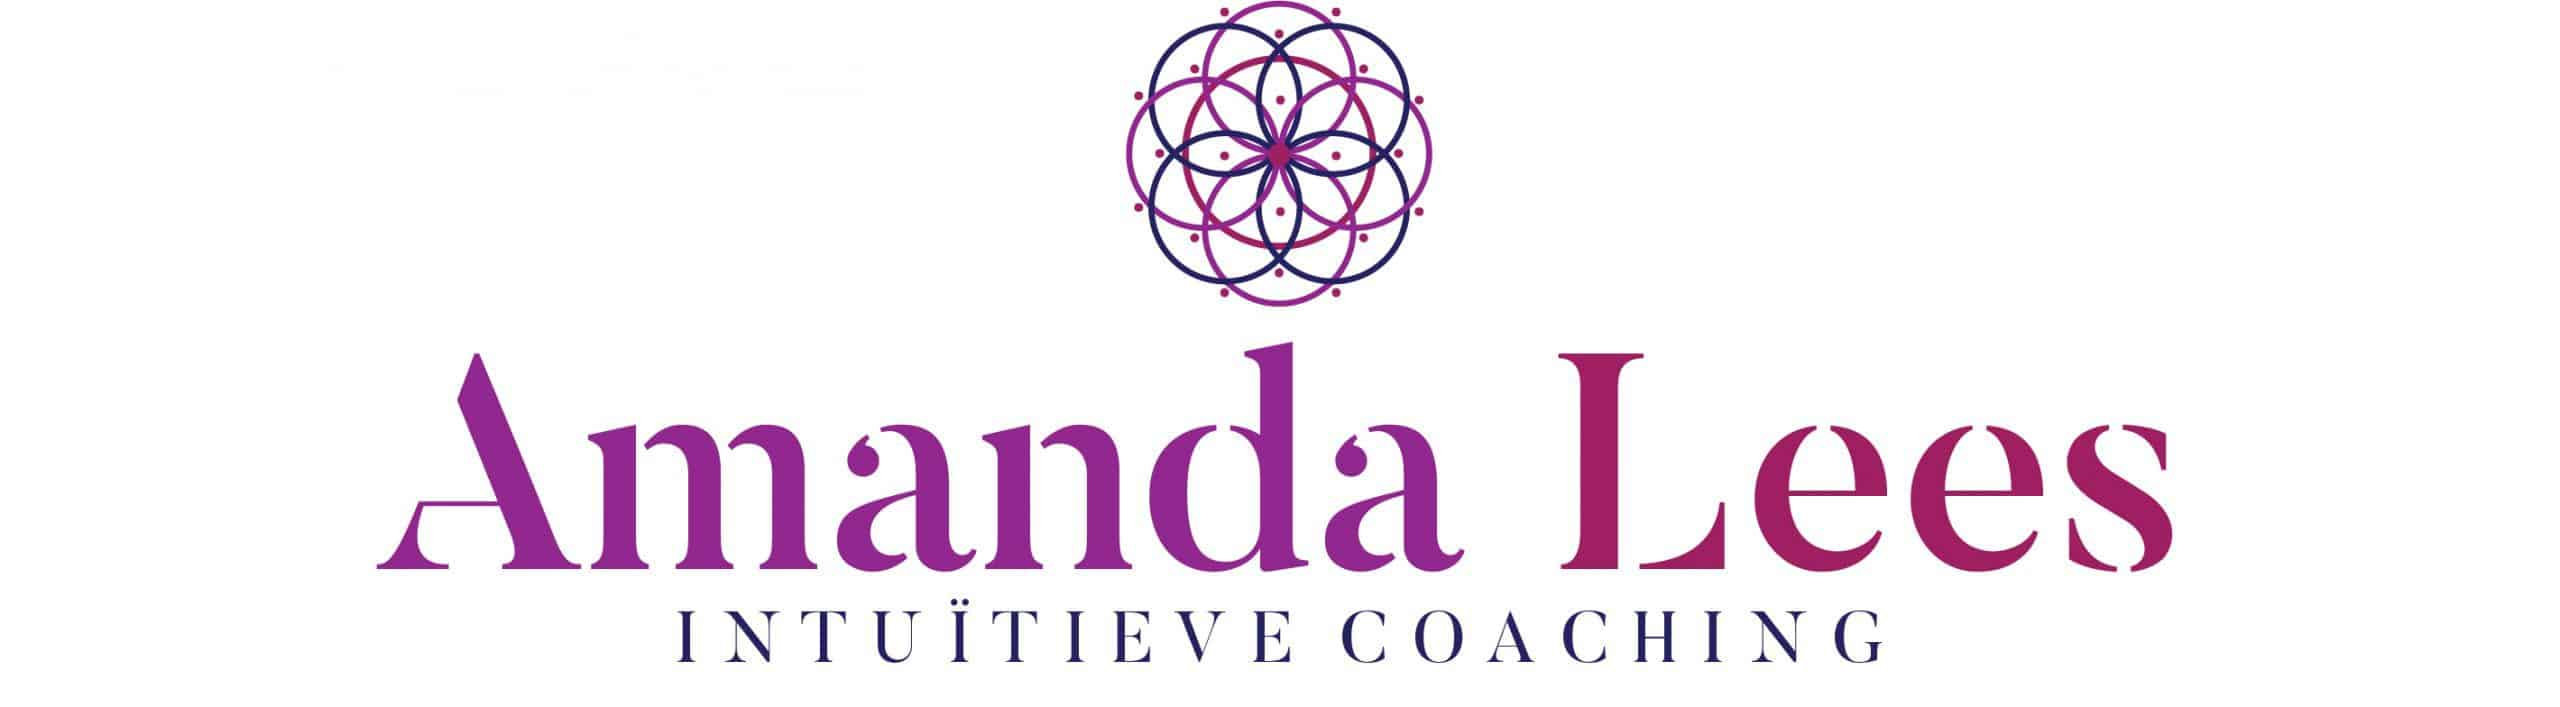 Amanda Lees - Intuïtieve coaching